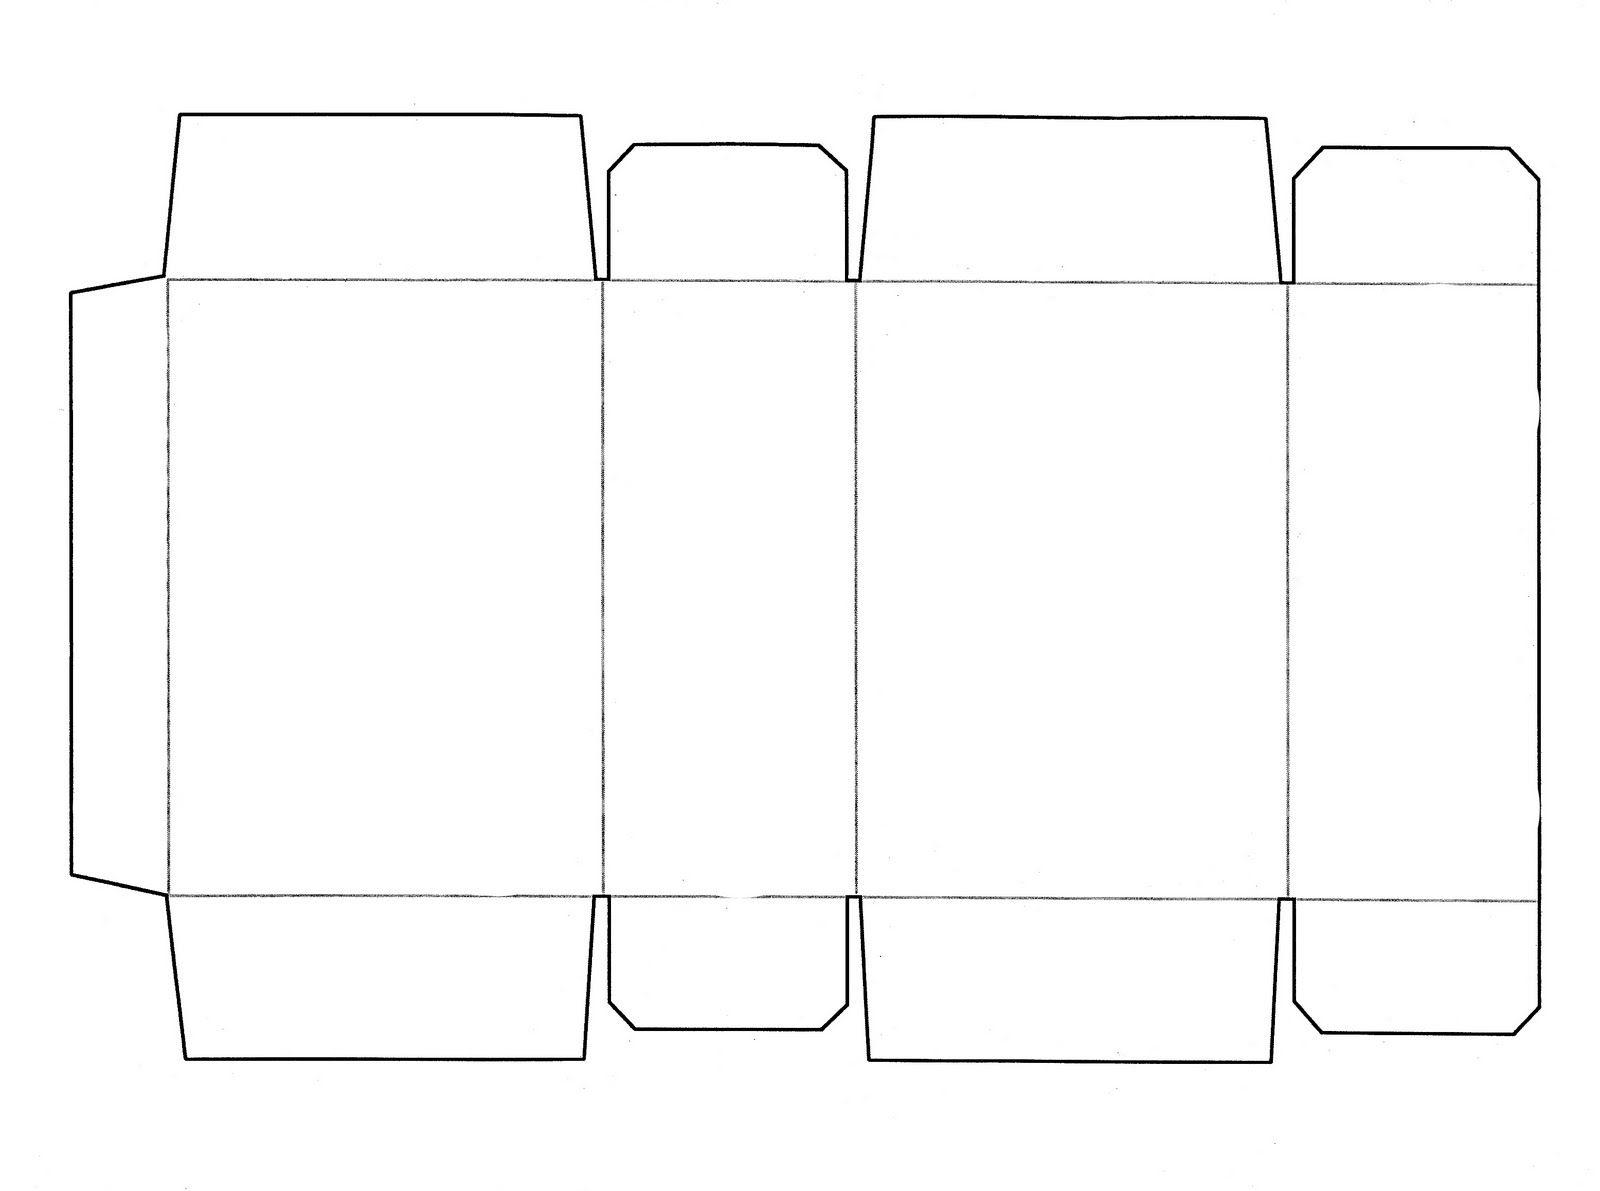 Cereal Box Template 2 | Digital Art | Pinterest | Molde, Cajas y Cartón